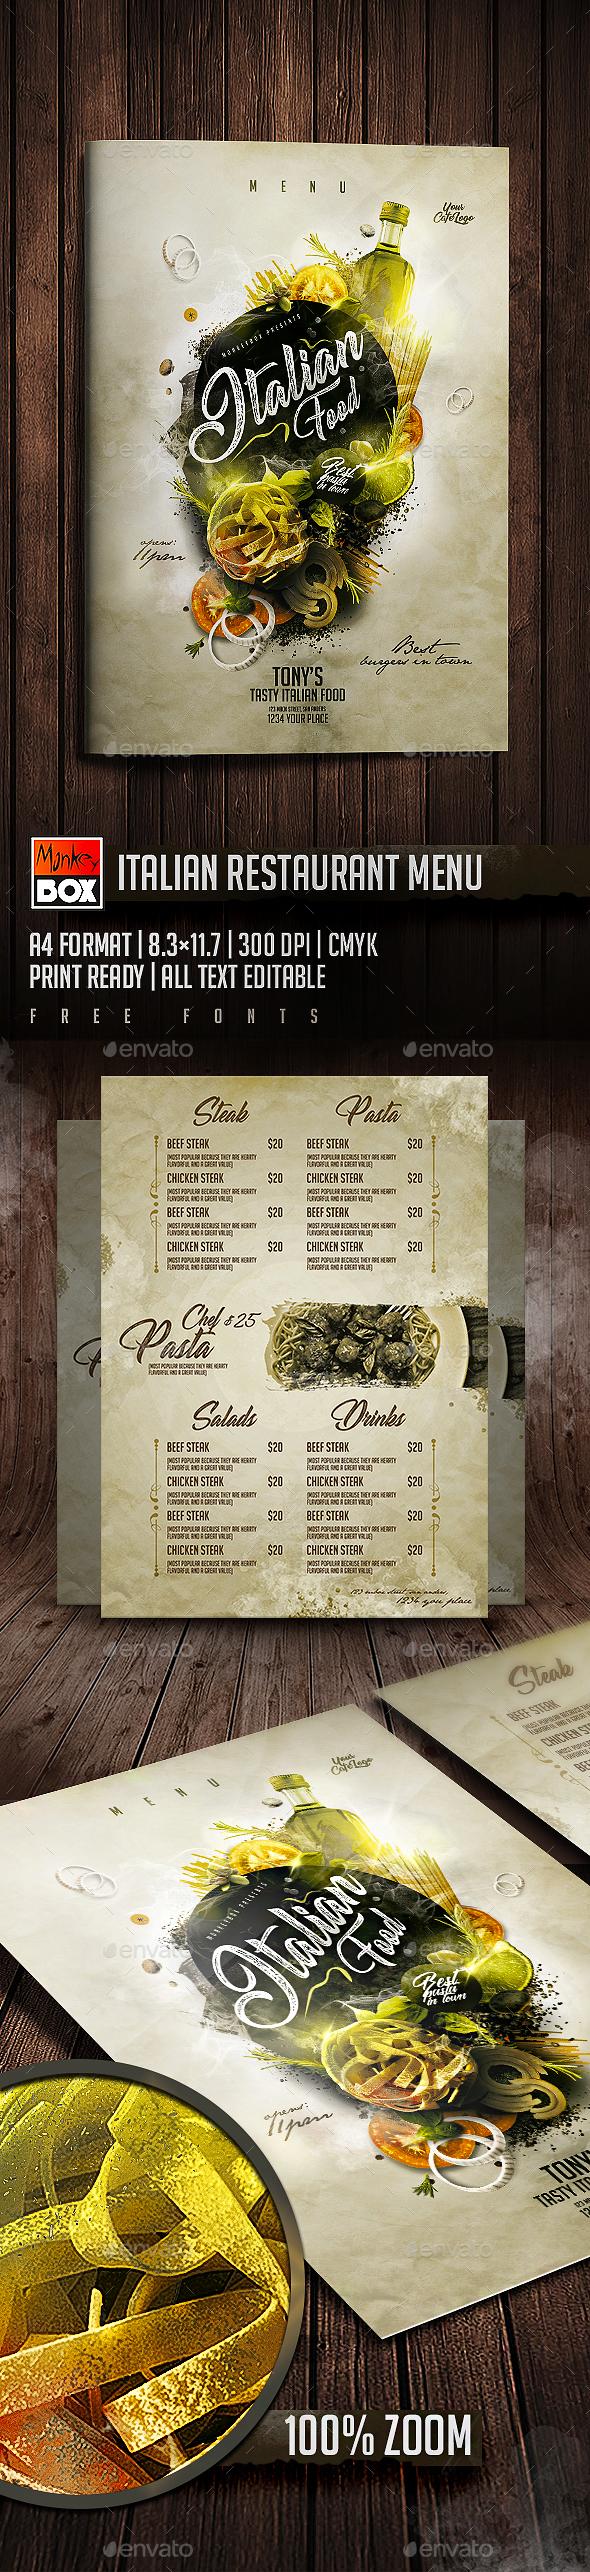 Italian Restaurant Menu - Food Menus Print Templates